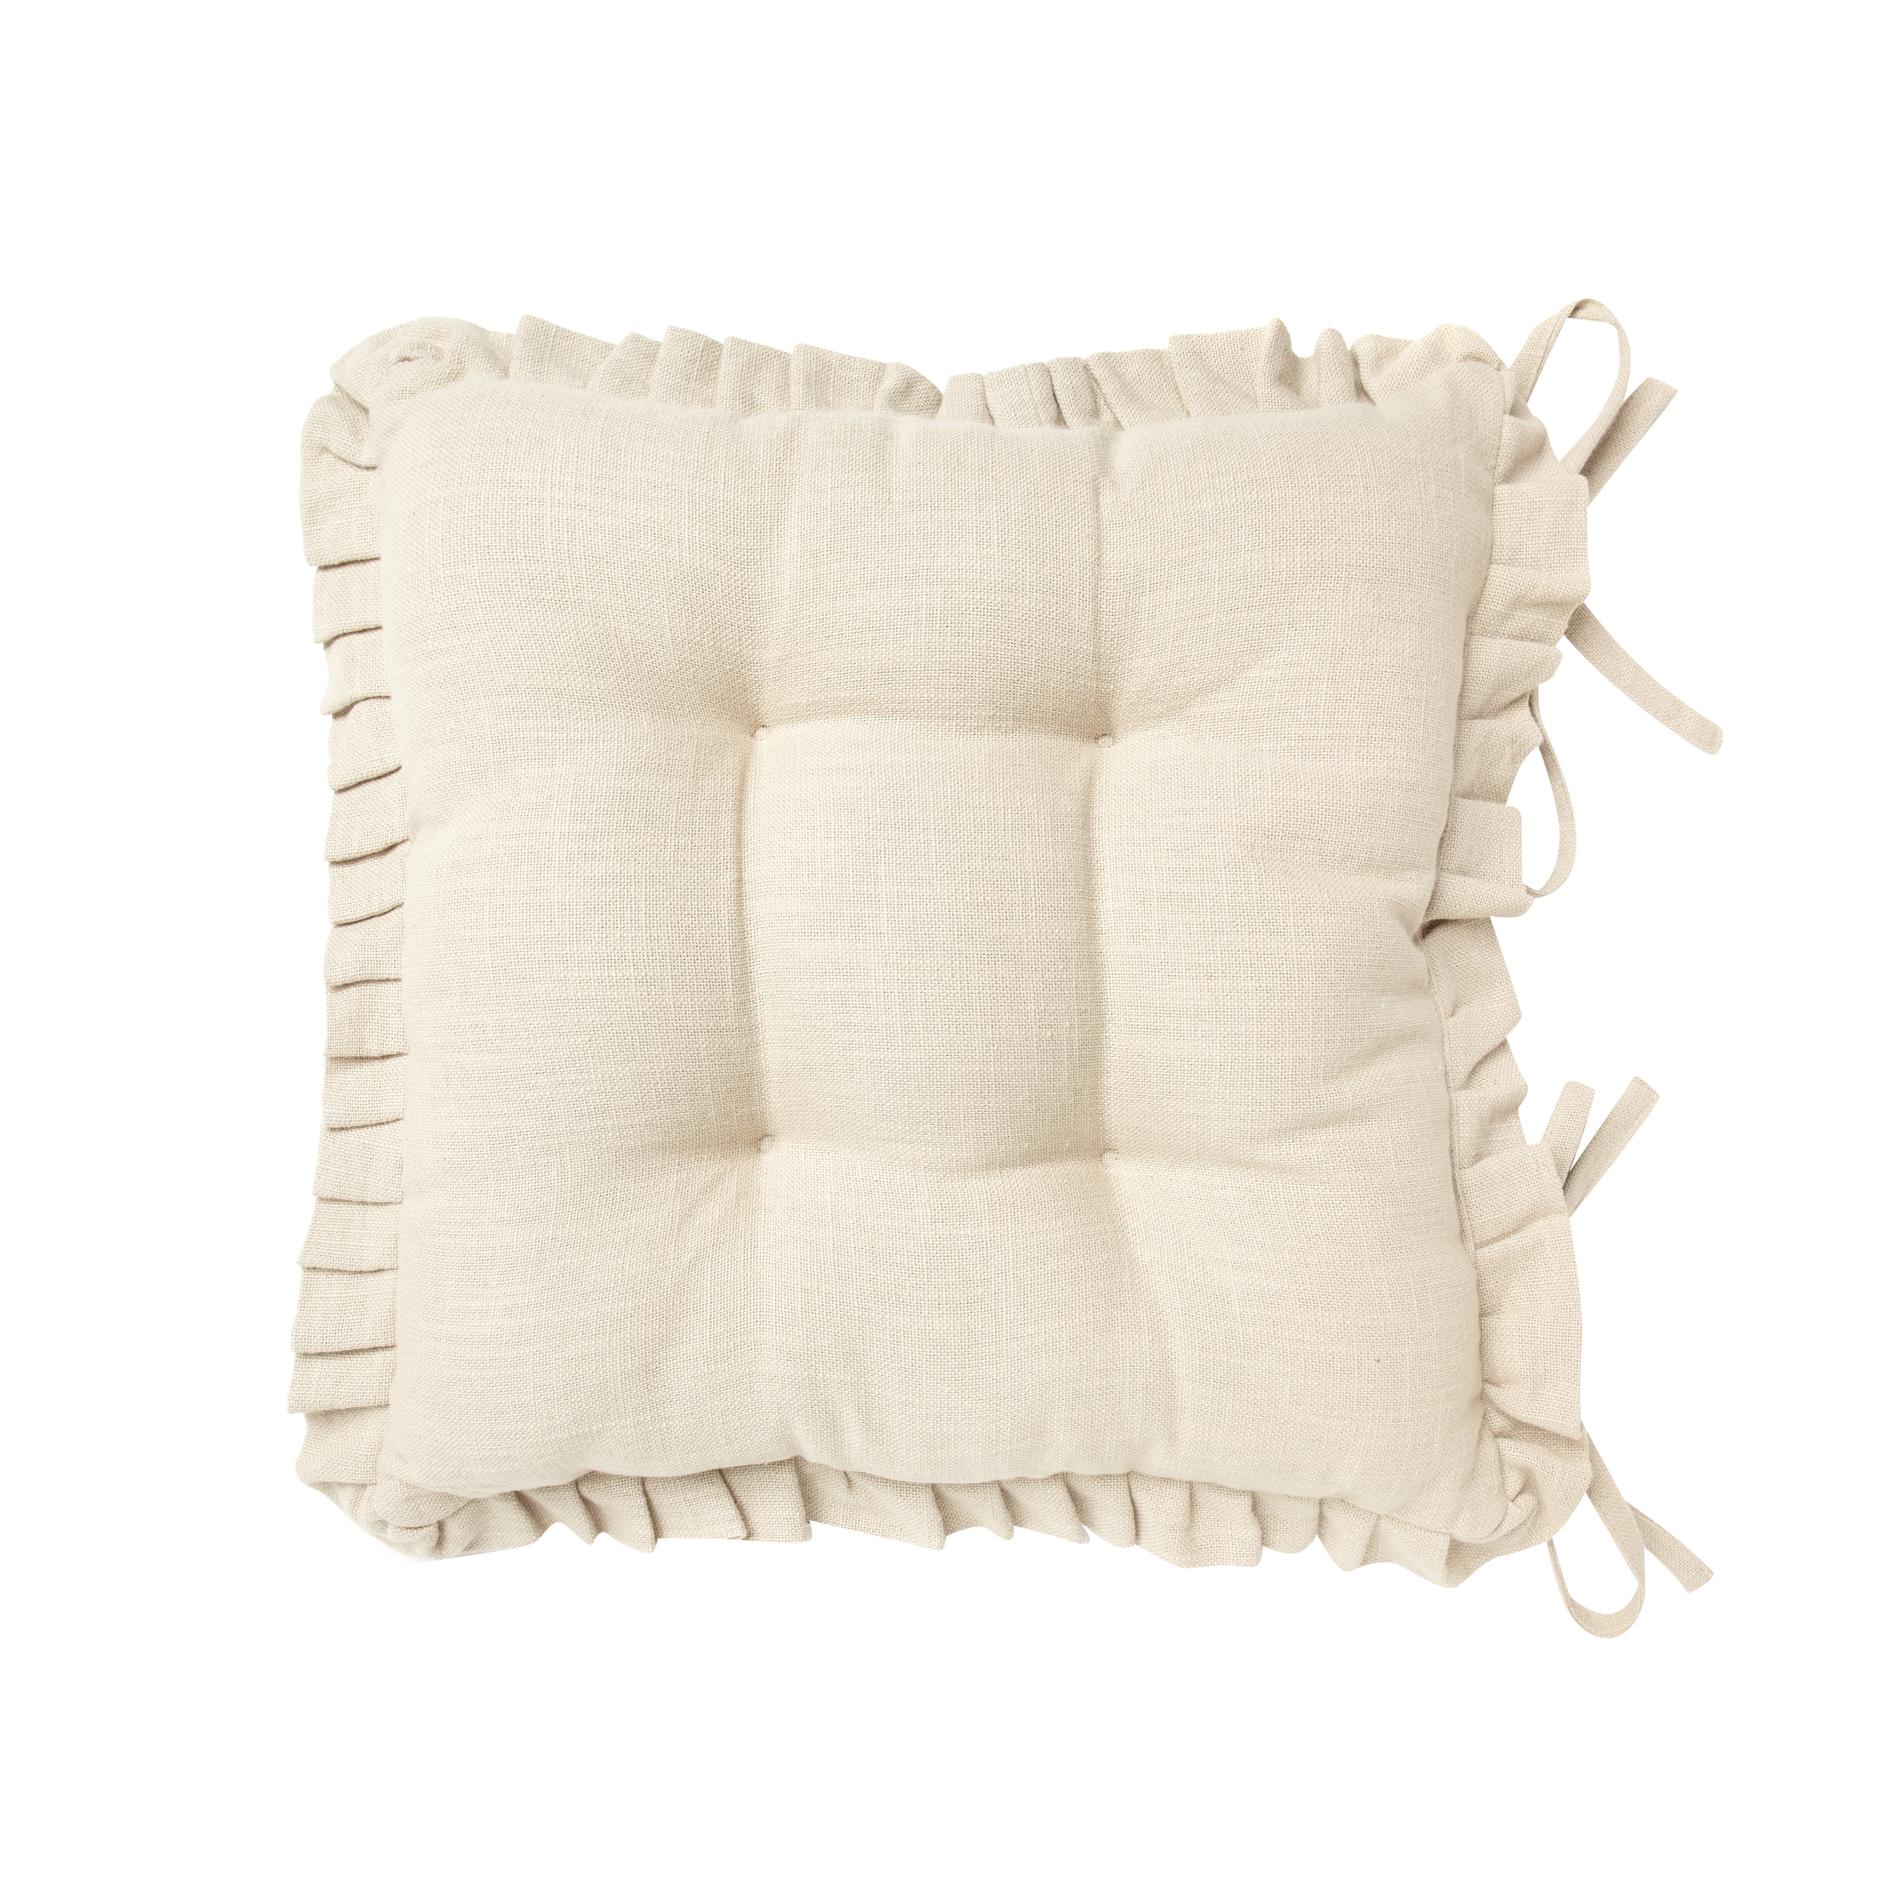 Cuscino sedia volant Burano - coincasa